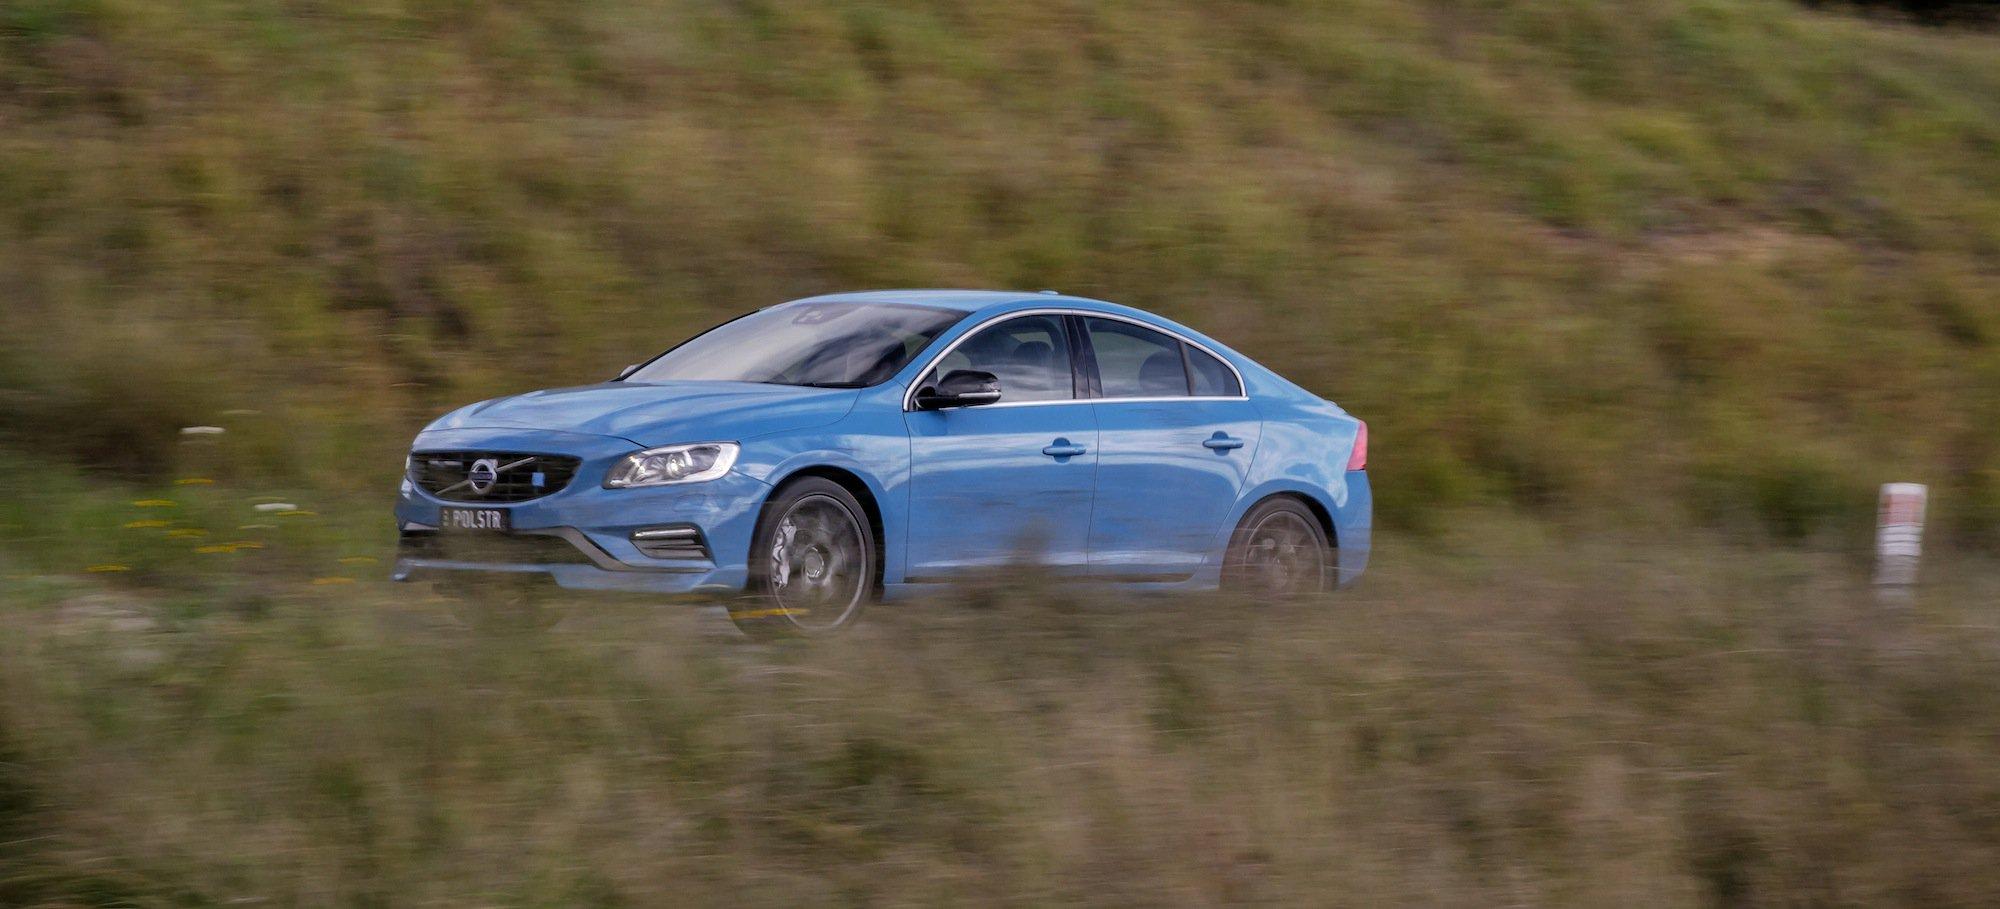 2014 Volvo S60 Polestar Review | CarAdvice